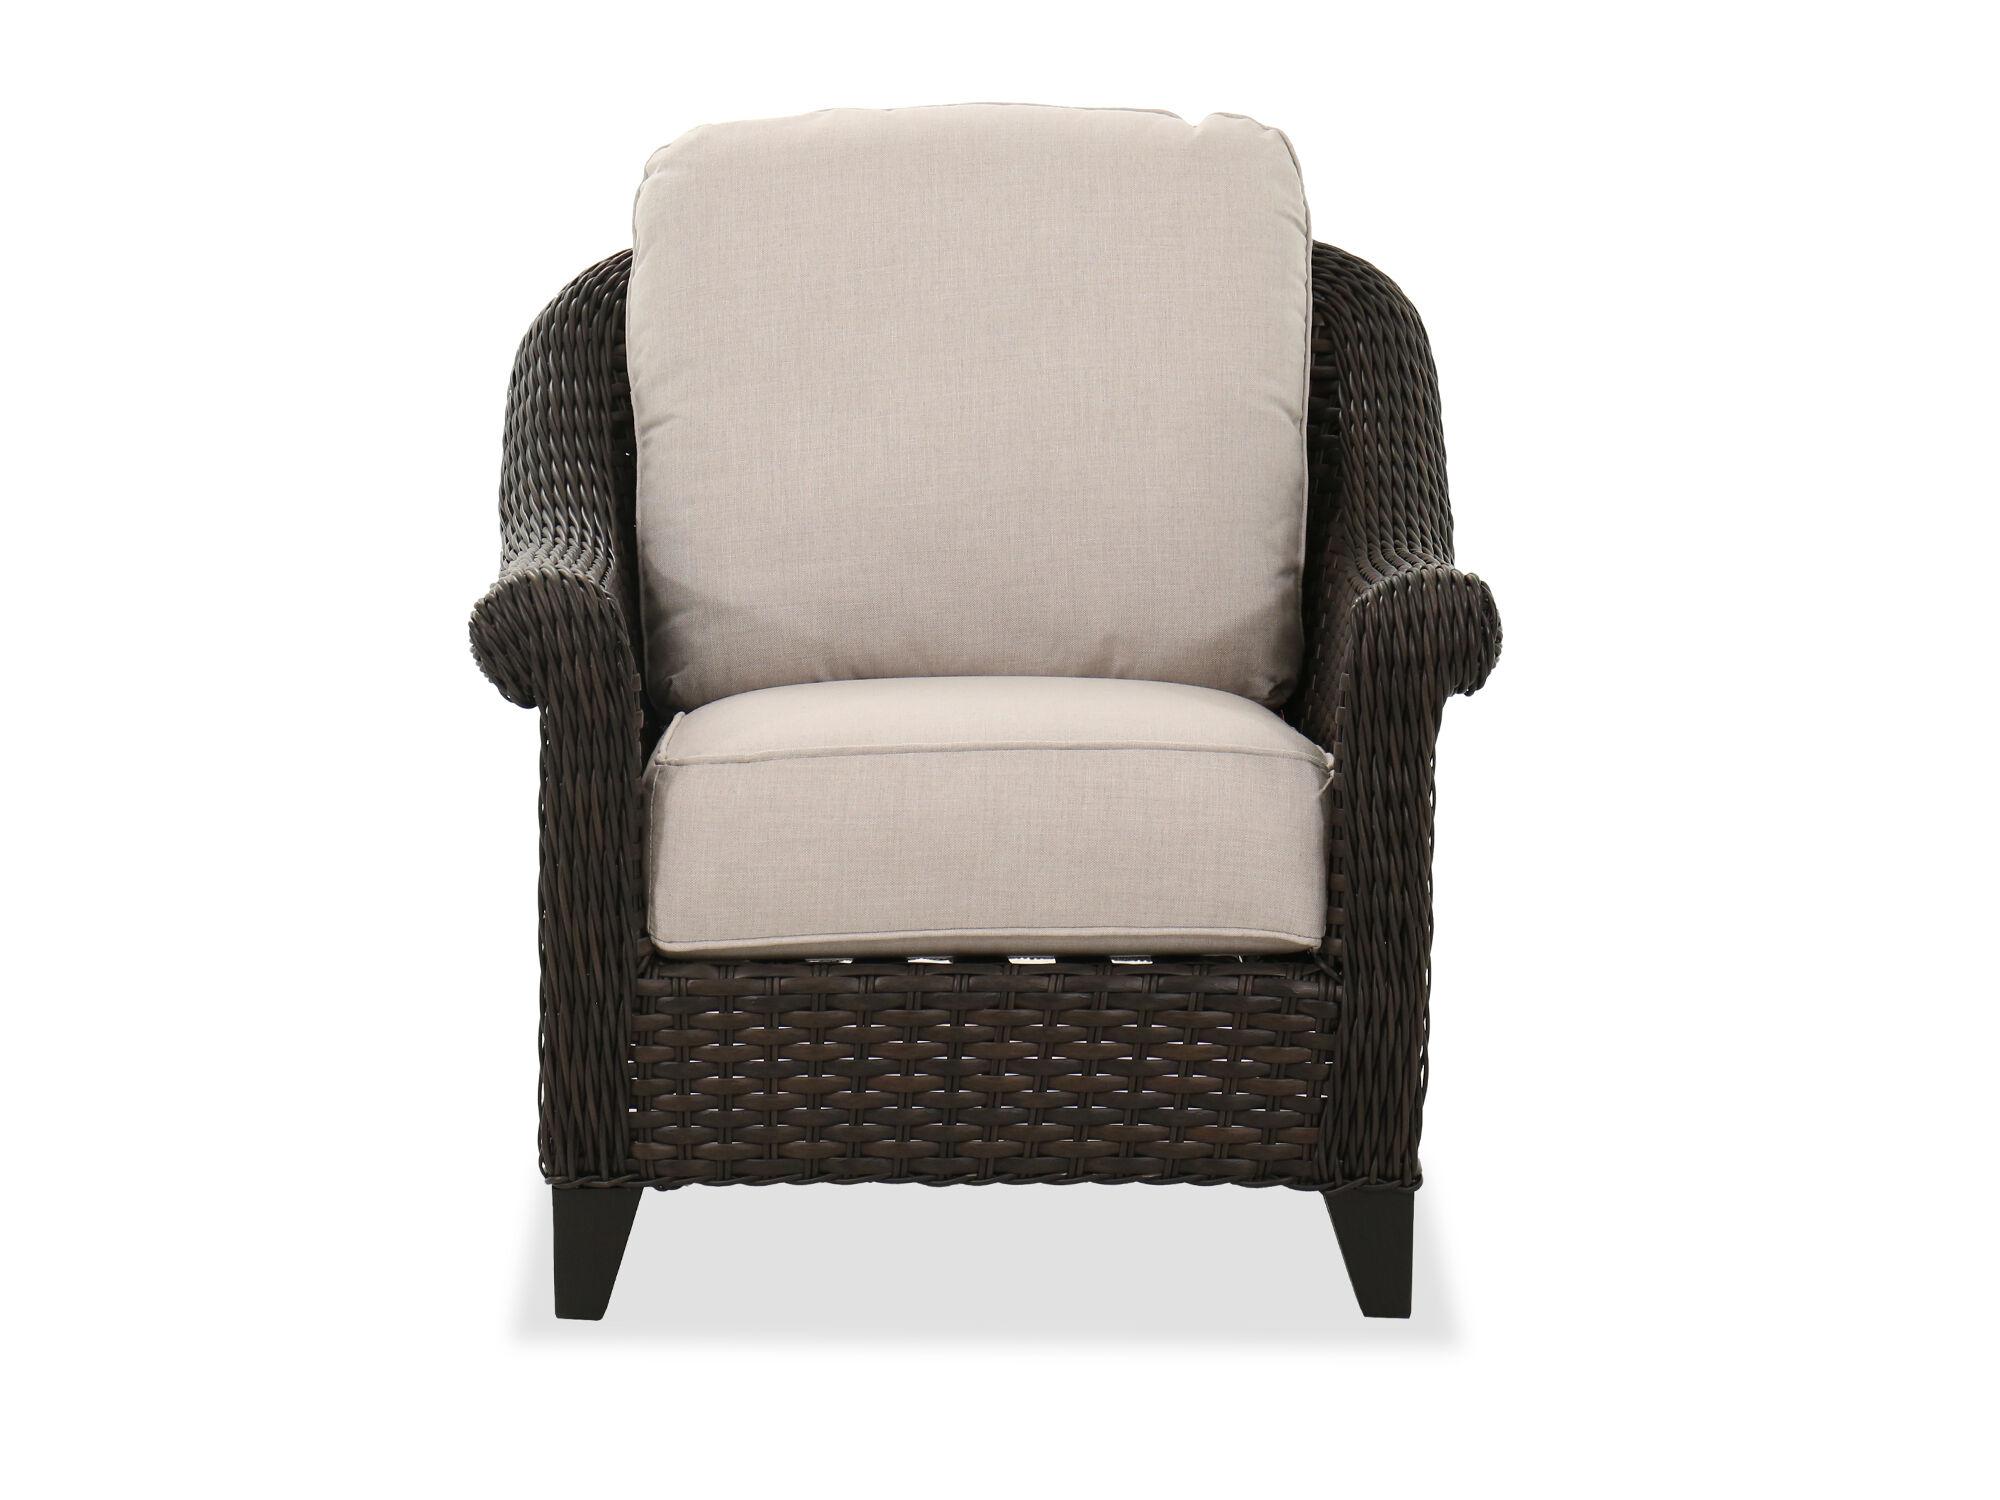 patio club chair in dark brown